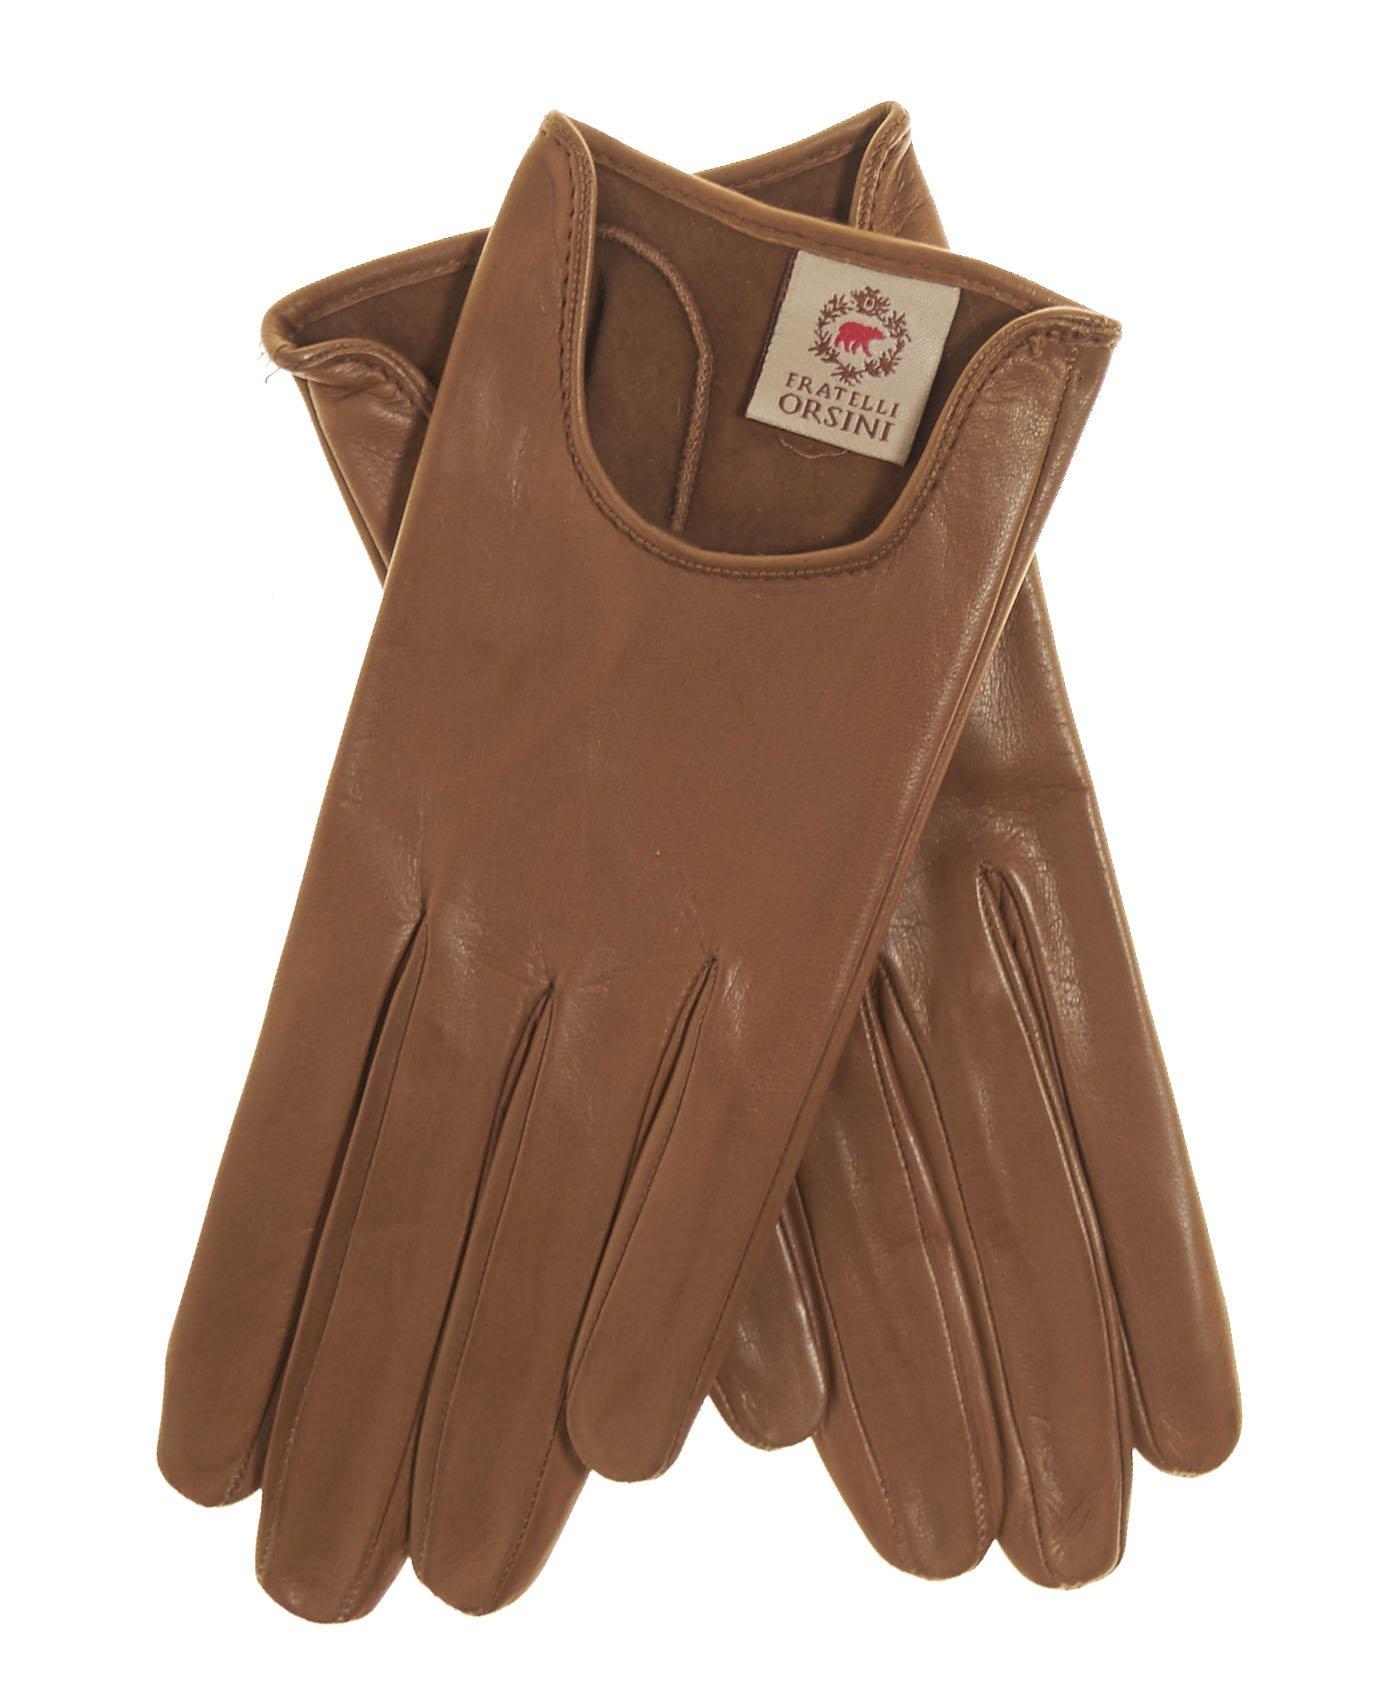 Fratelli Orsini Women's Short Unlined Italian Leather Gloves Size 7 1/2 Color Camel